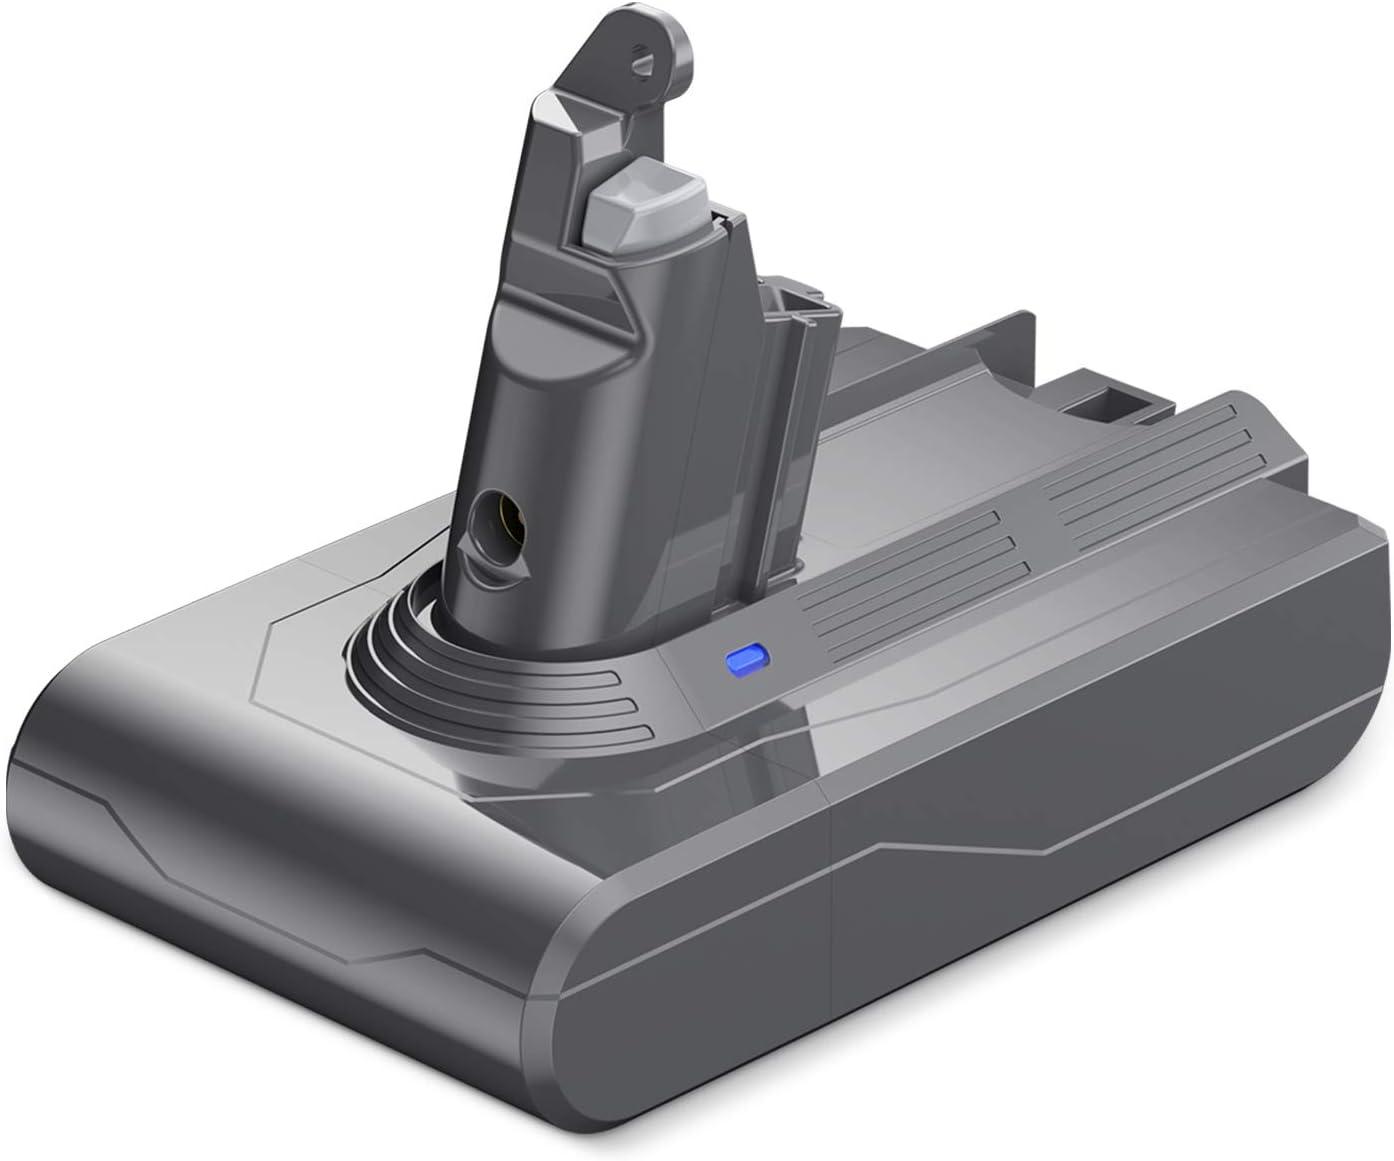 FirstPower 4.0Ah Replacement Battery - Compatible for V6 SV04 DC58 DC59 DC61 DC62 DC72 DC74 Absolute Animal Motorhead Slim SV03 SV04 SV05 SV06 SV07 SV09